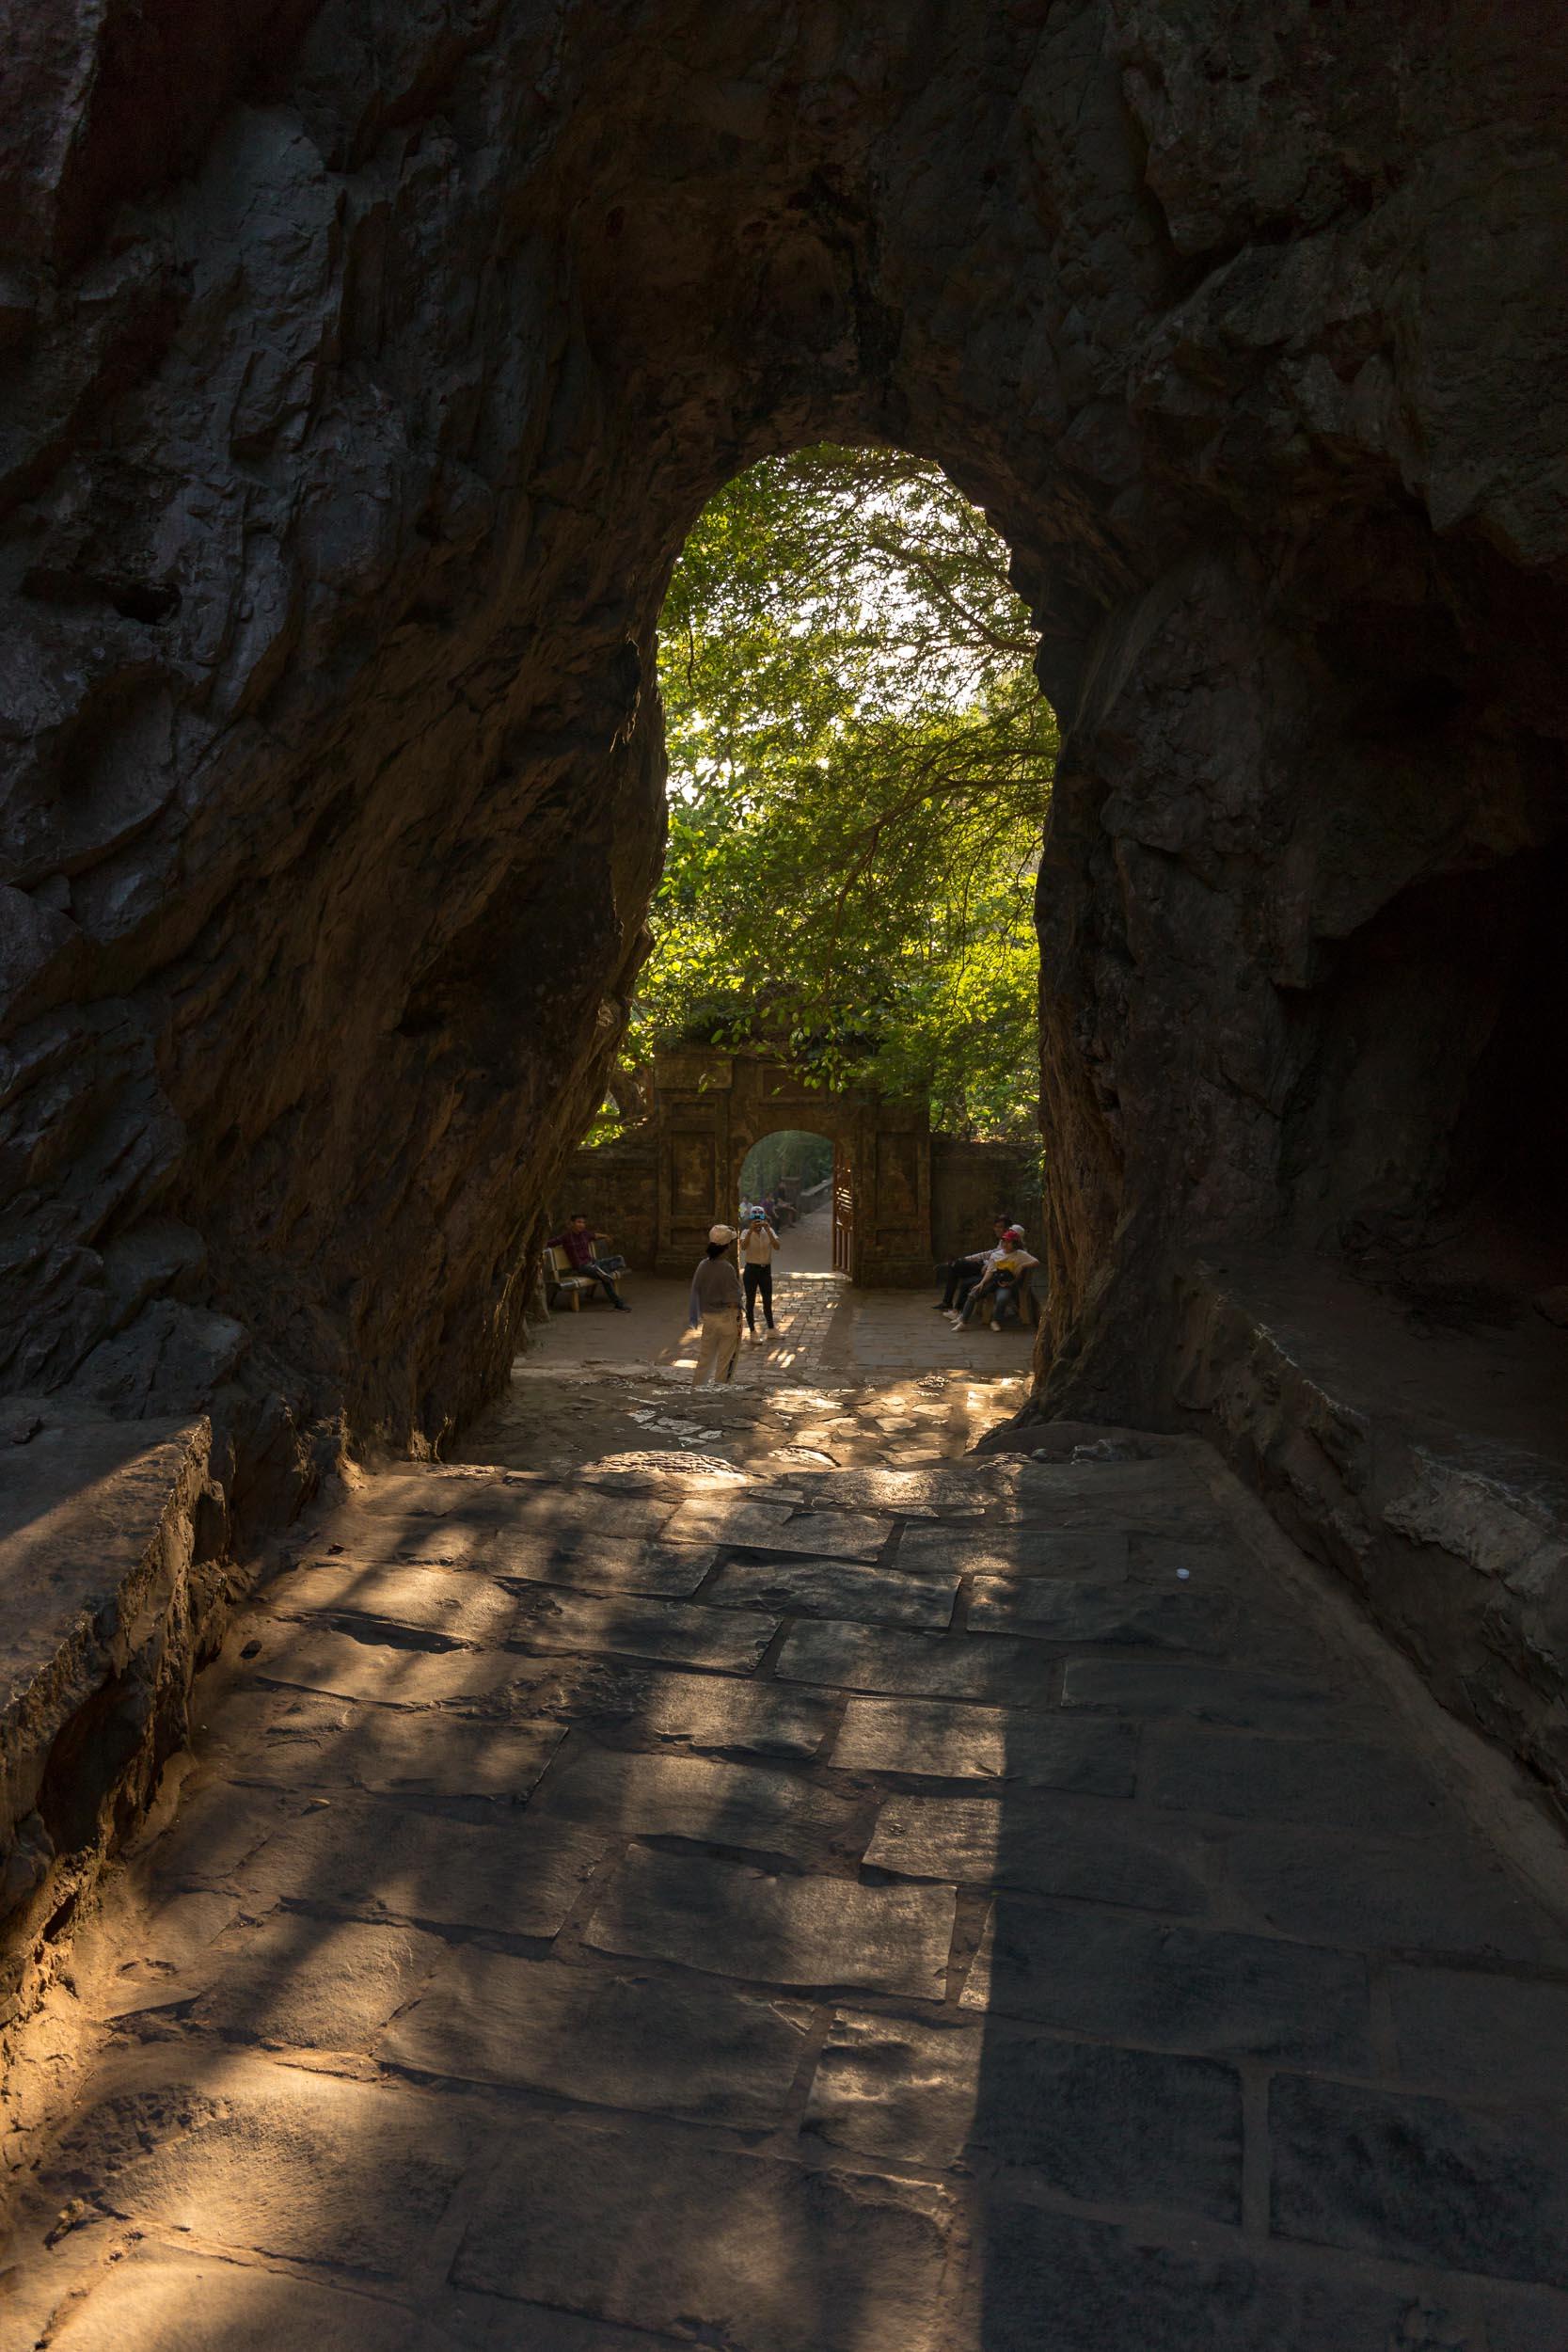 Cave on the Marble Mountain, Da Nang, Vietnam.